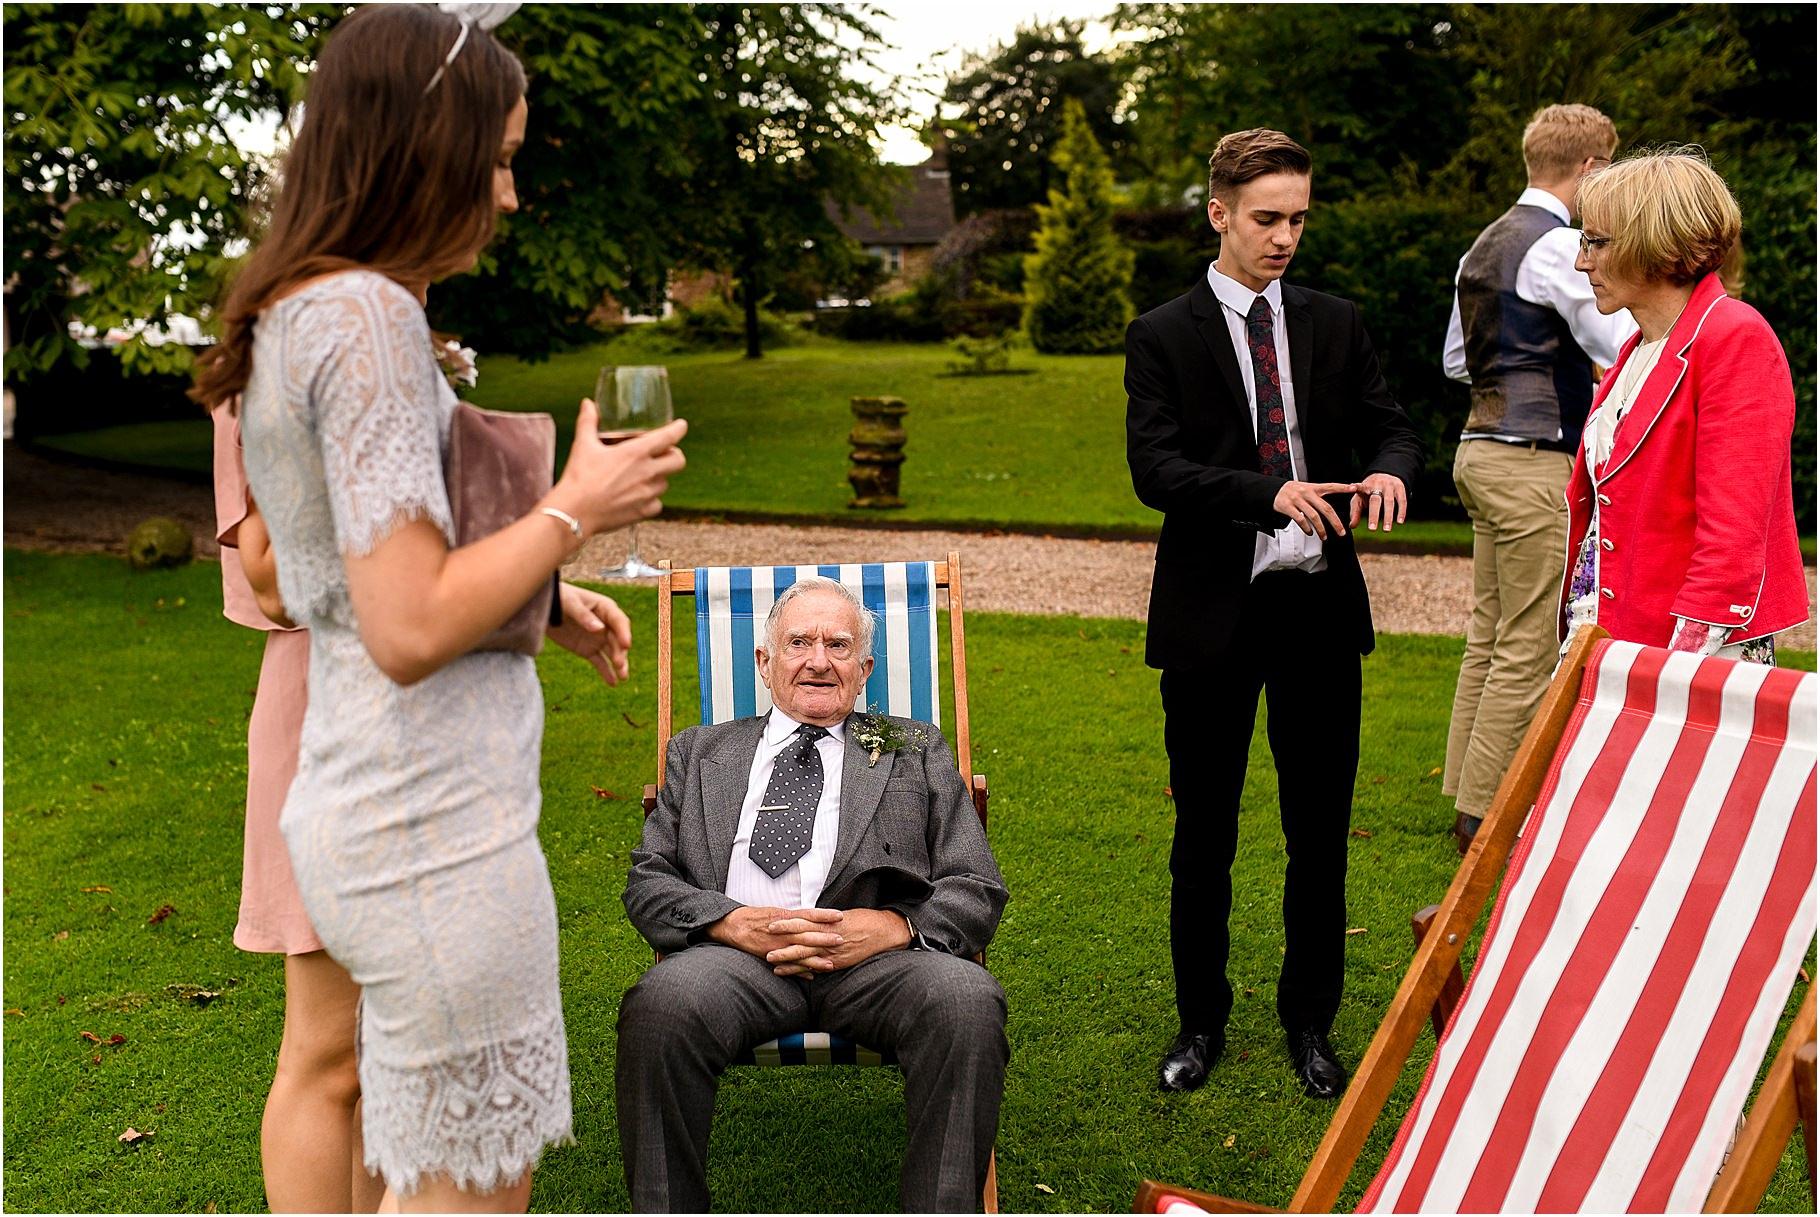 dan-wootton-photography-2017-weddings-100.jpg